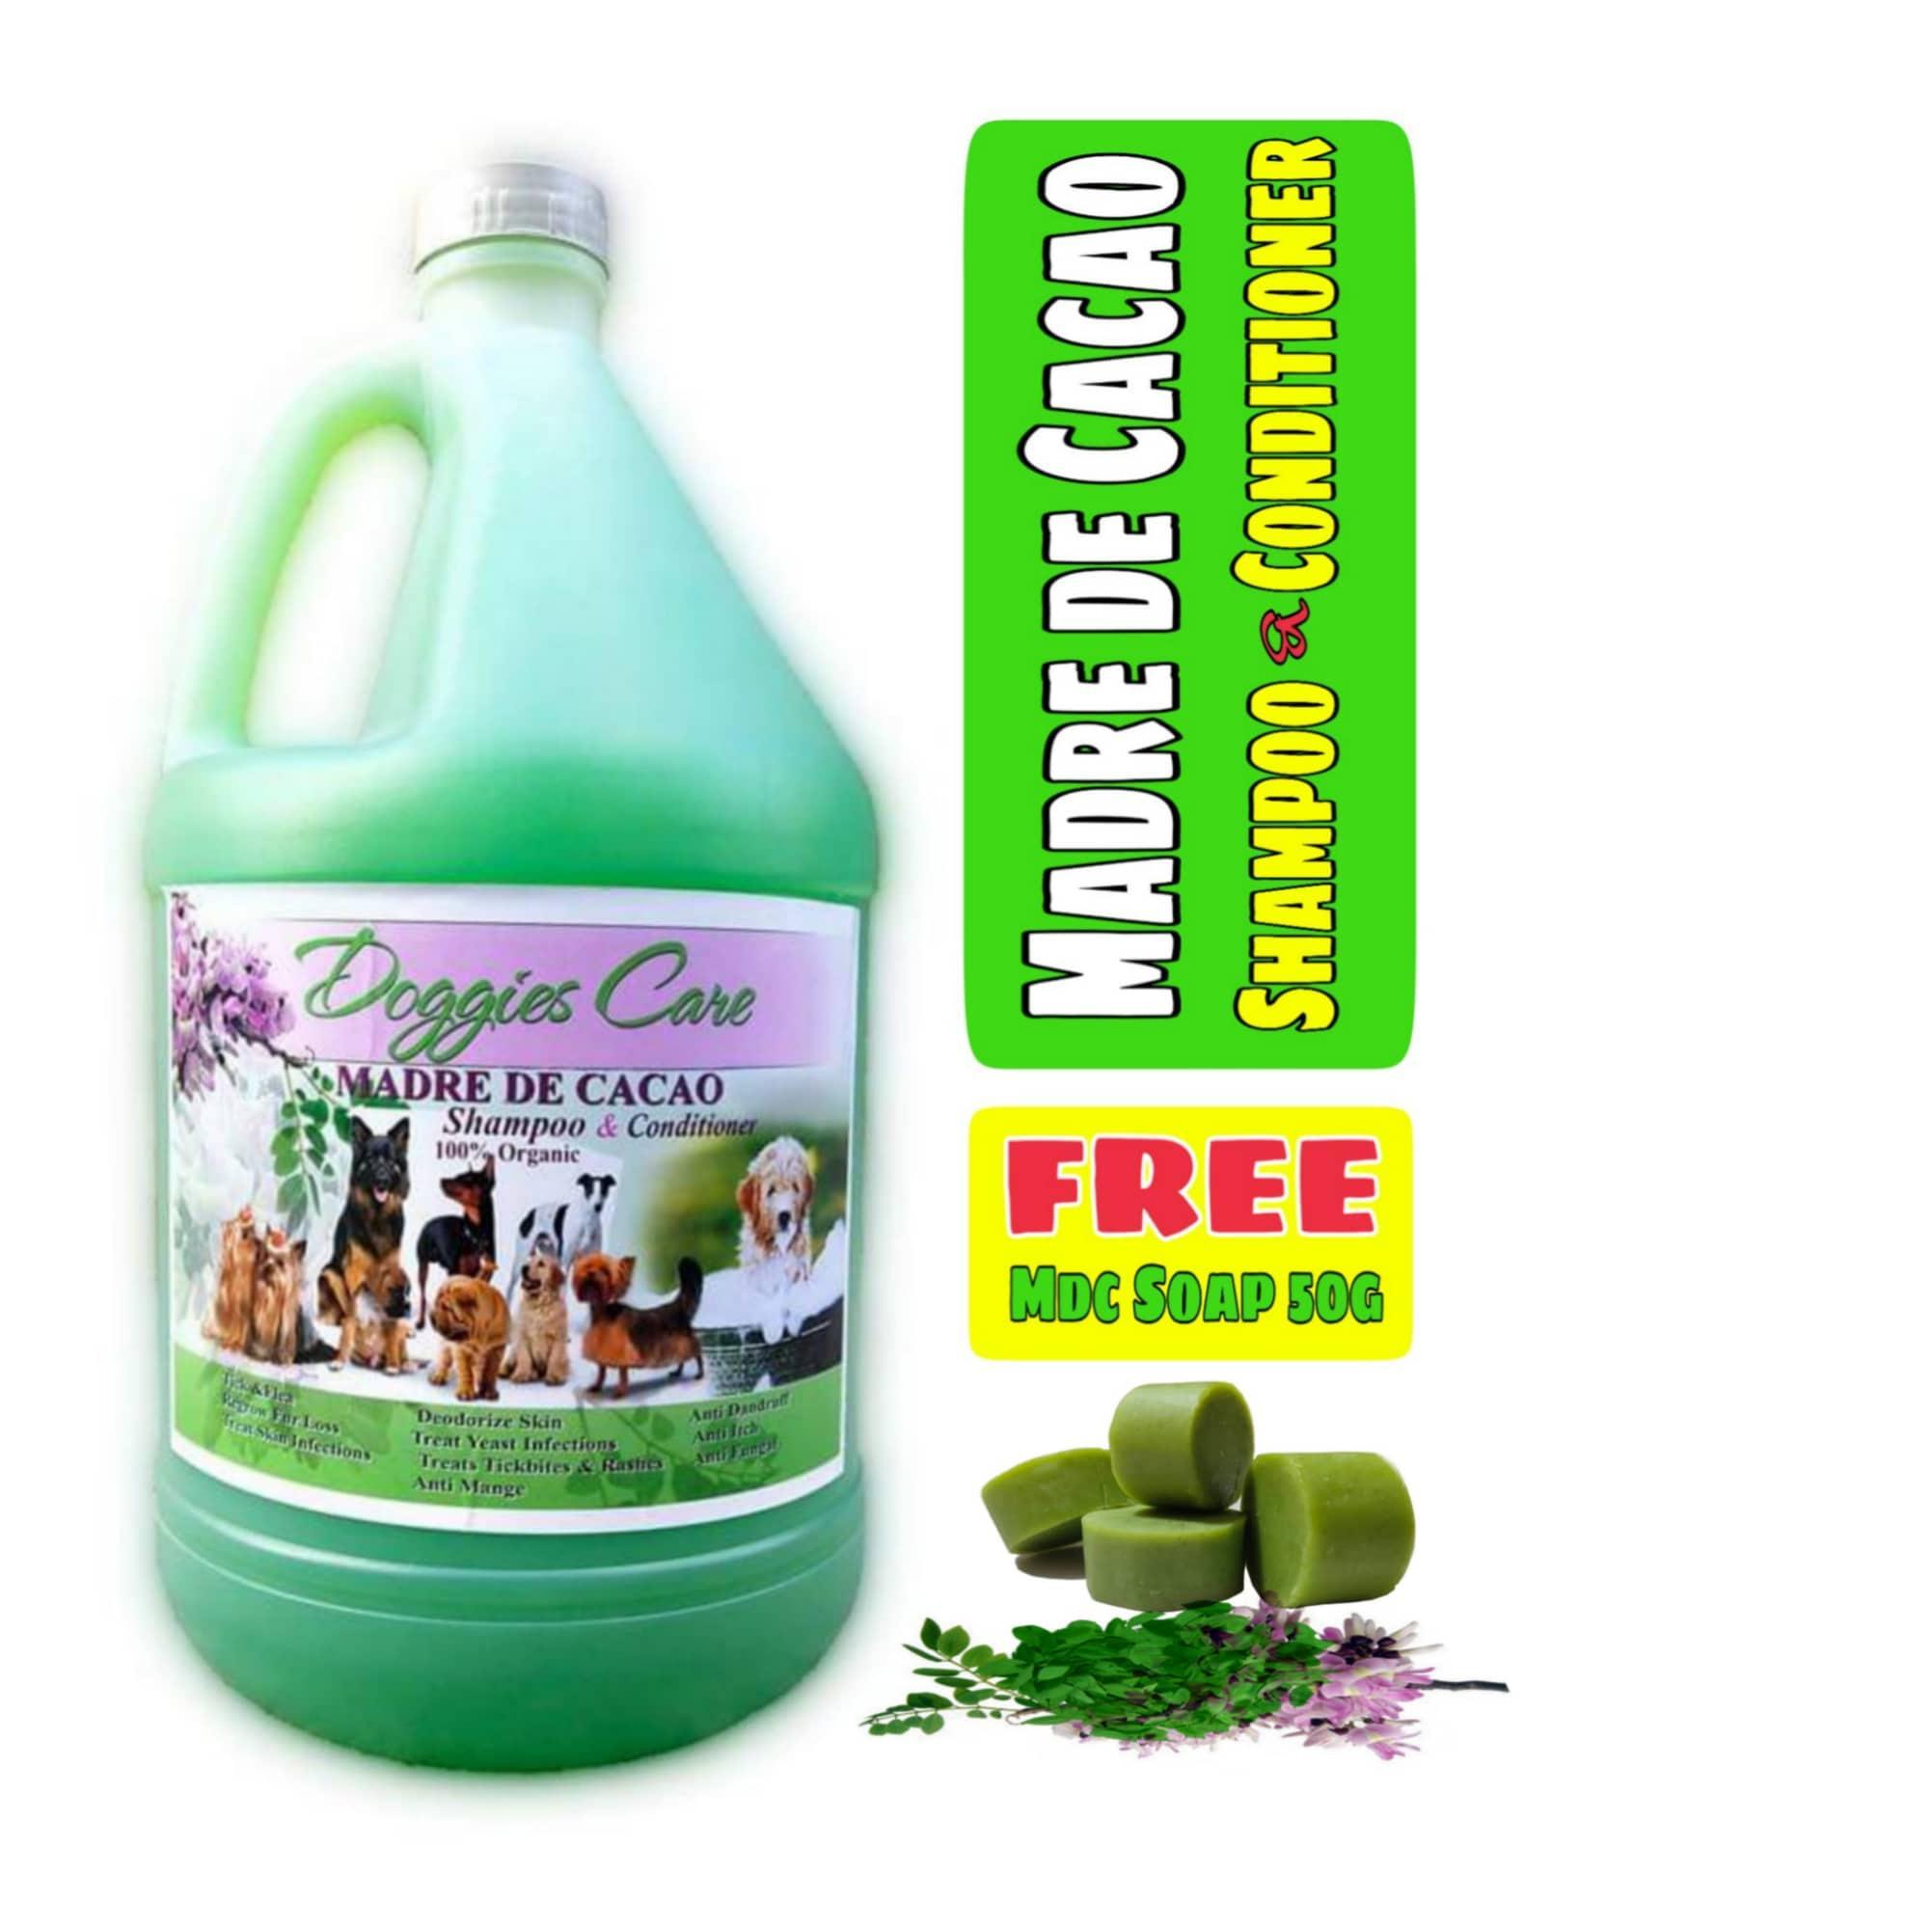 Madre De Cacao Shampoo & Conditioner With Guava Extract - Baby Powder Scent 1 Gallon Green Free Mdc Soap 50g By Madre De Cacao Doggiescare.